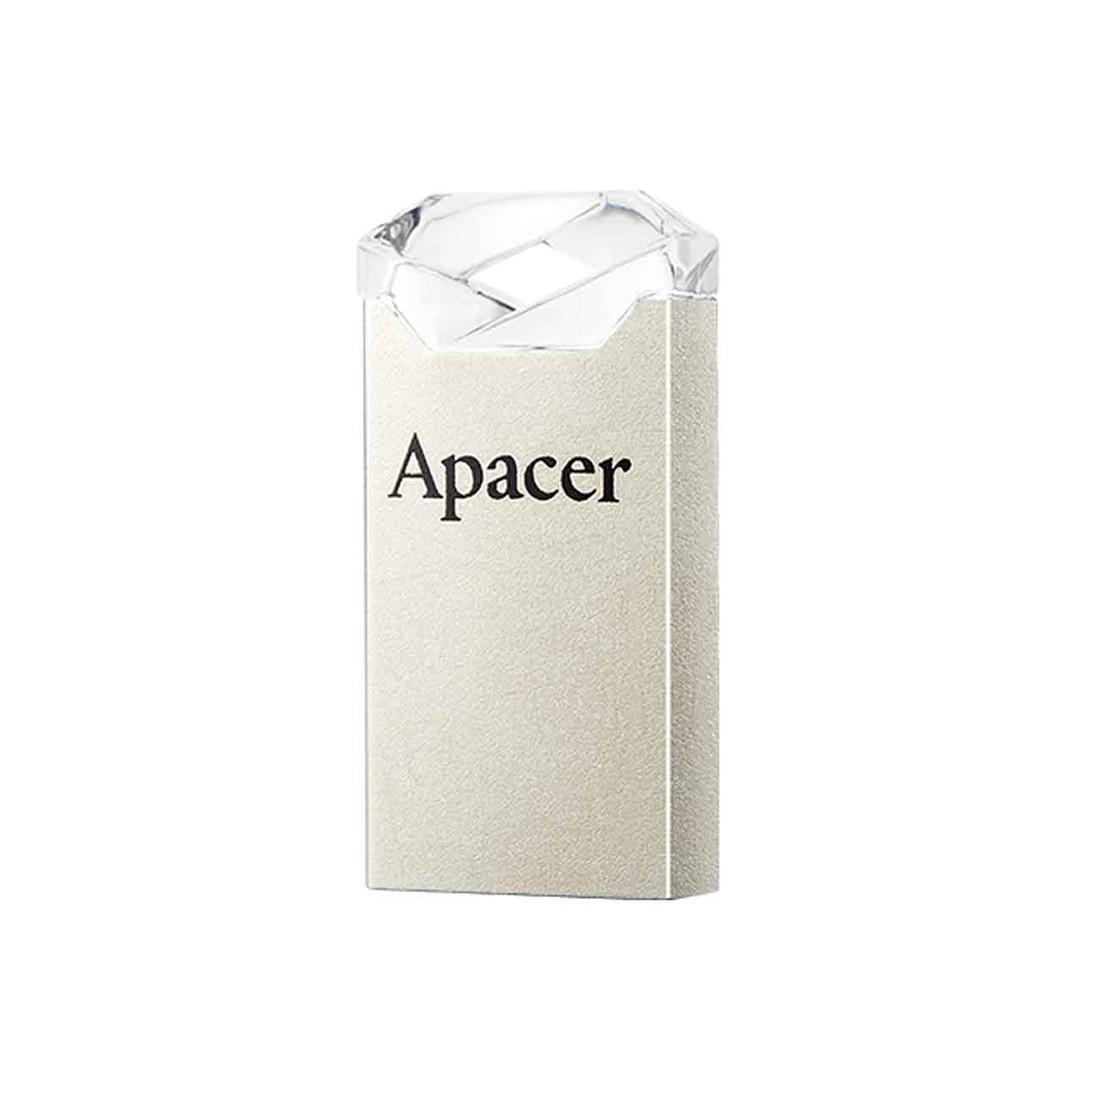 USB-накопитель, Apacer, AH111, AP64GAH111CR-1, 64GB, USB 2.0, Белый